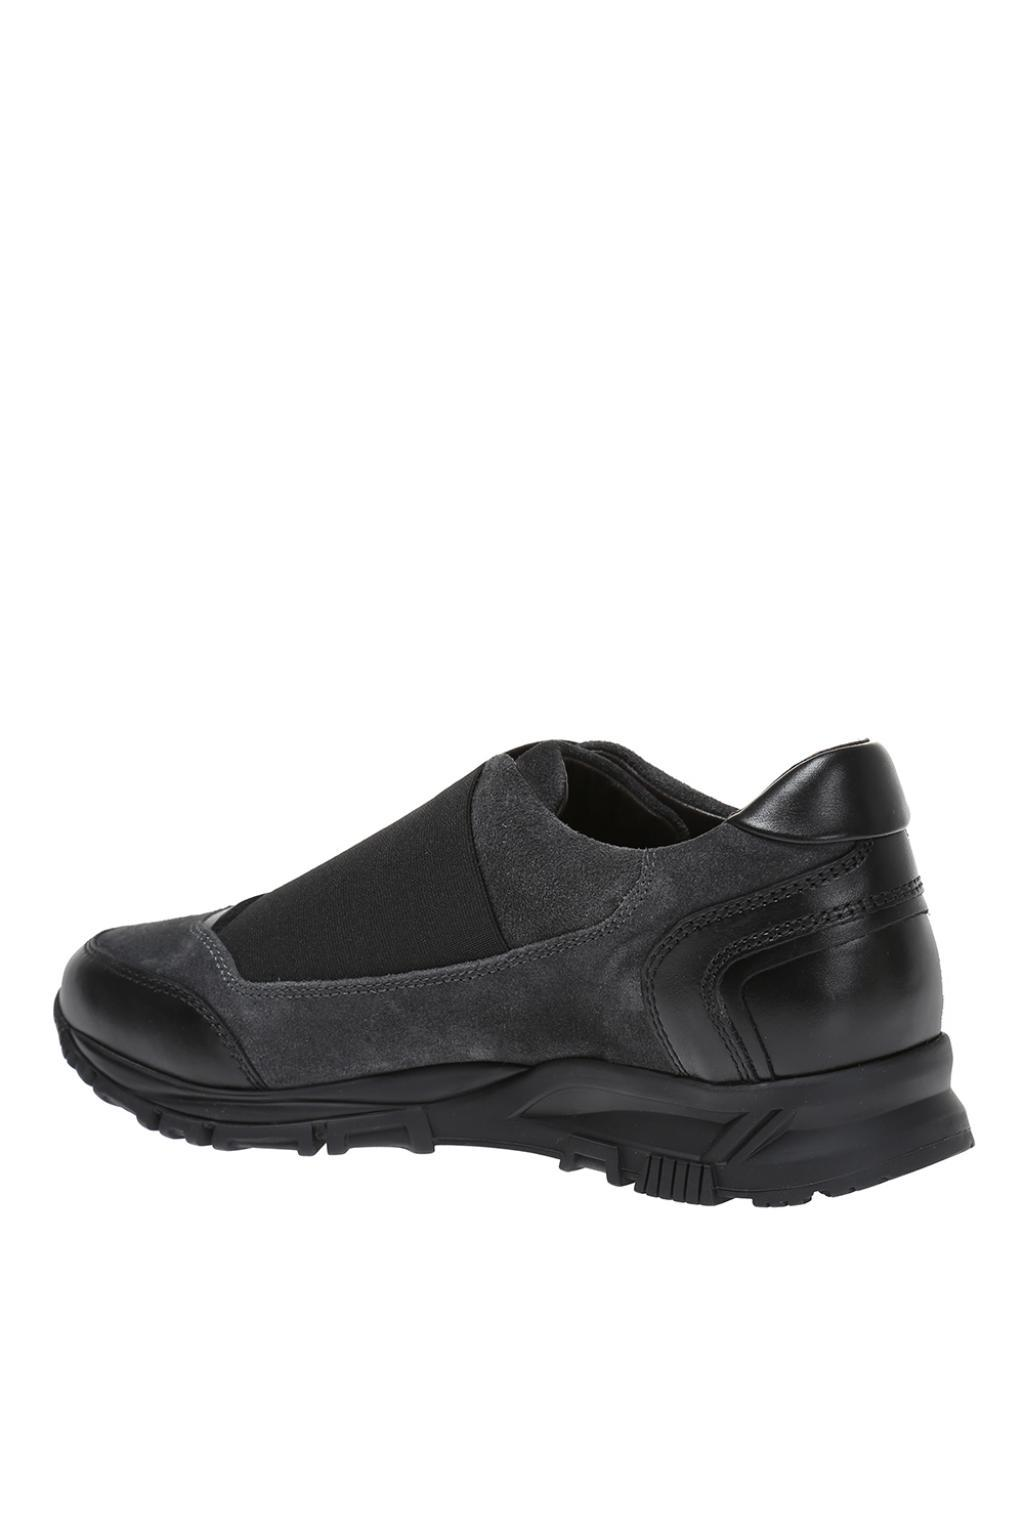 Lanvin Suede Sneakers in Grey (Grey) for Men